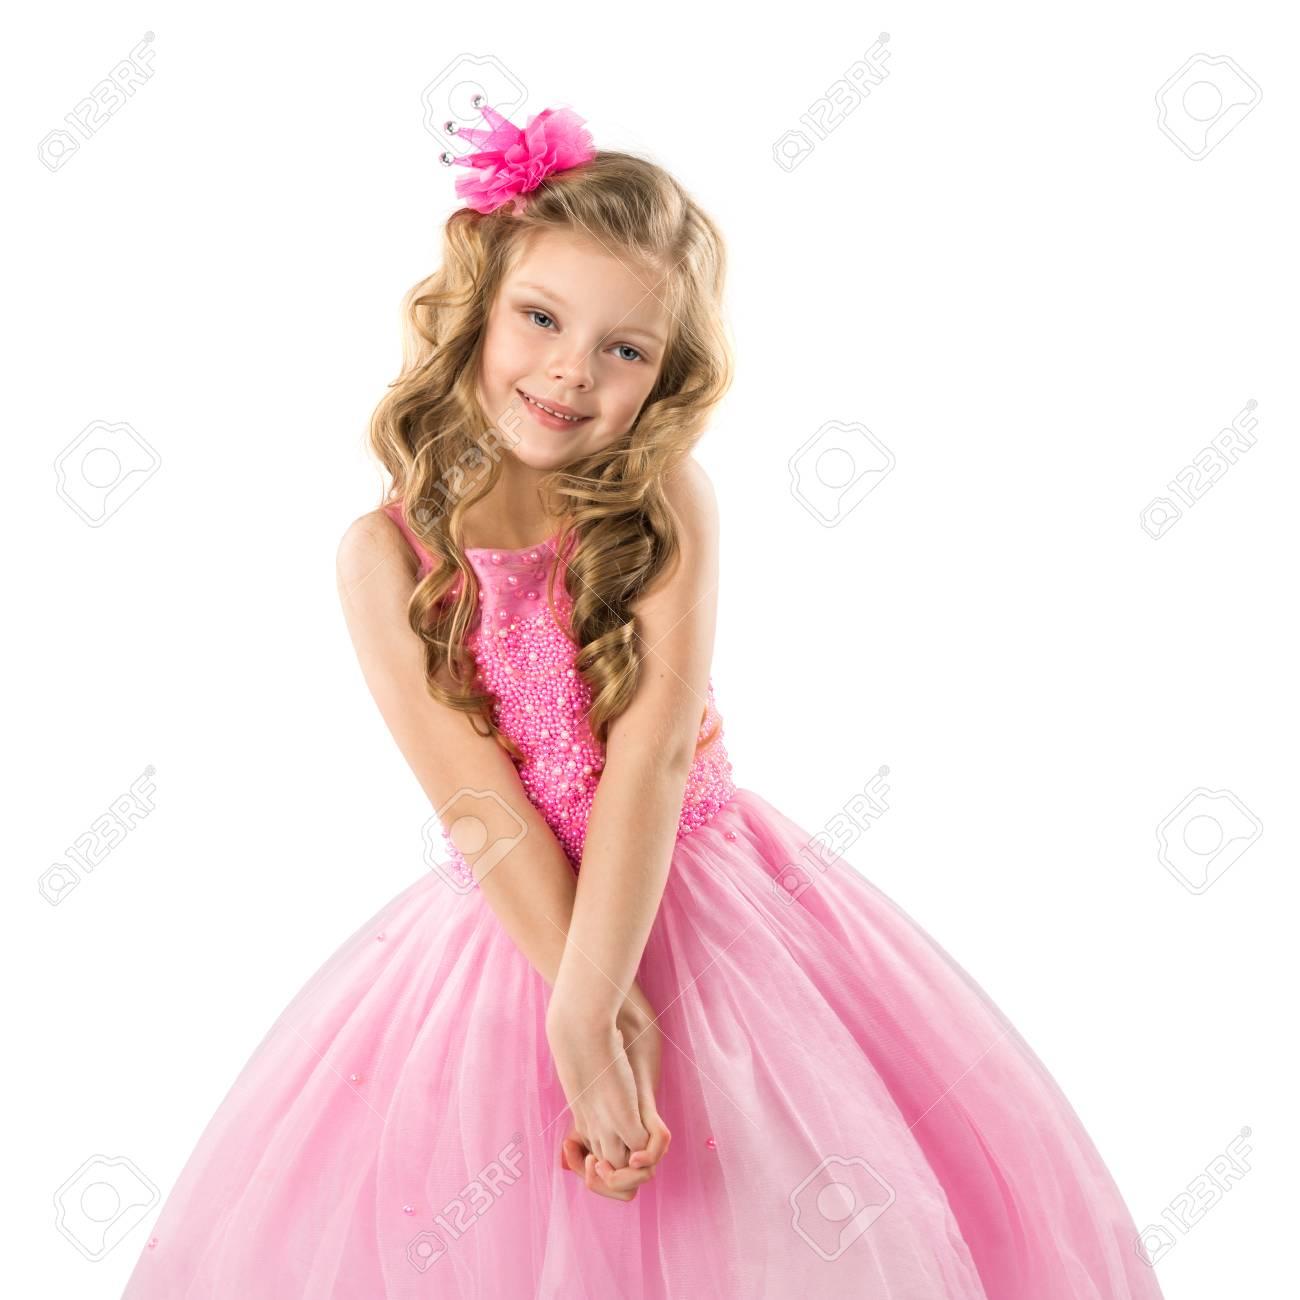 2451c609c Cute Little Girl In Pink Princess Dress